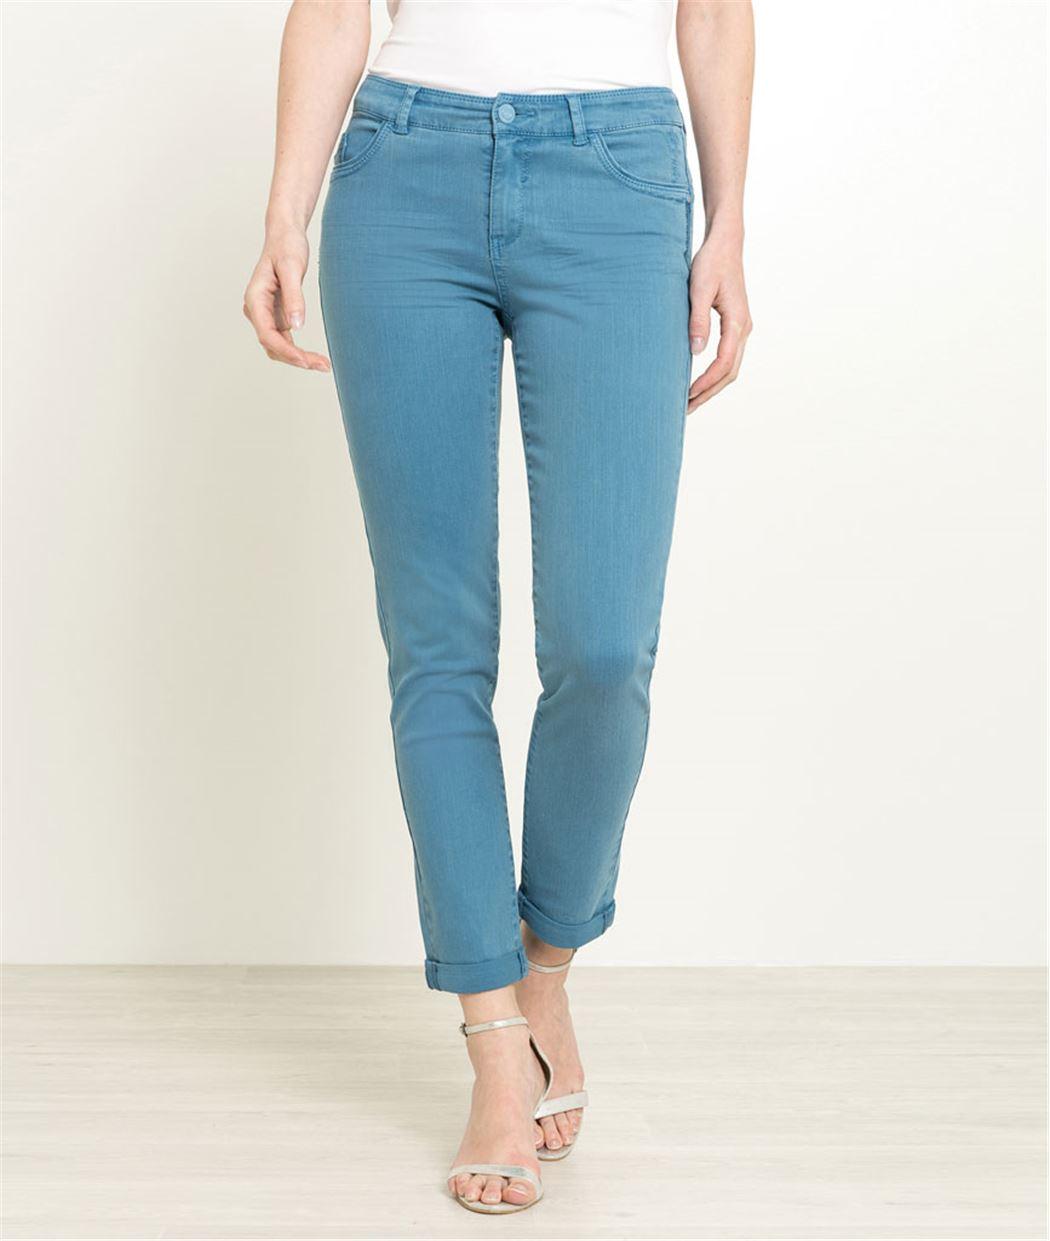 Pantalon raccourci femme couleur BLEU